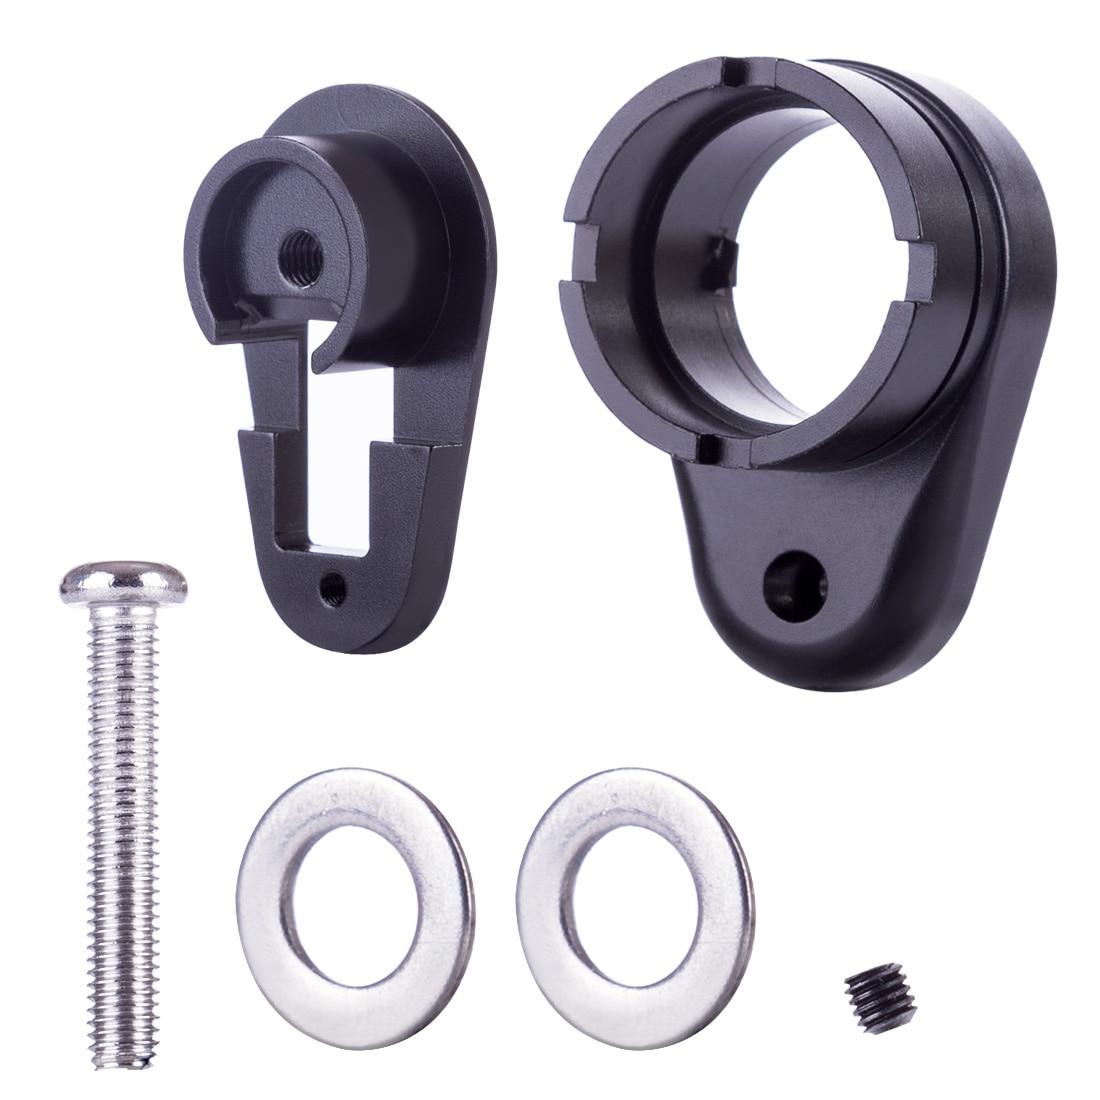 XWE M4 Stock Core Adaptor Quick Release Version For XWE M4 Water Gel Beads Blaster Modification Upgrade - Black